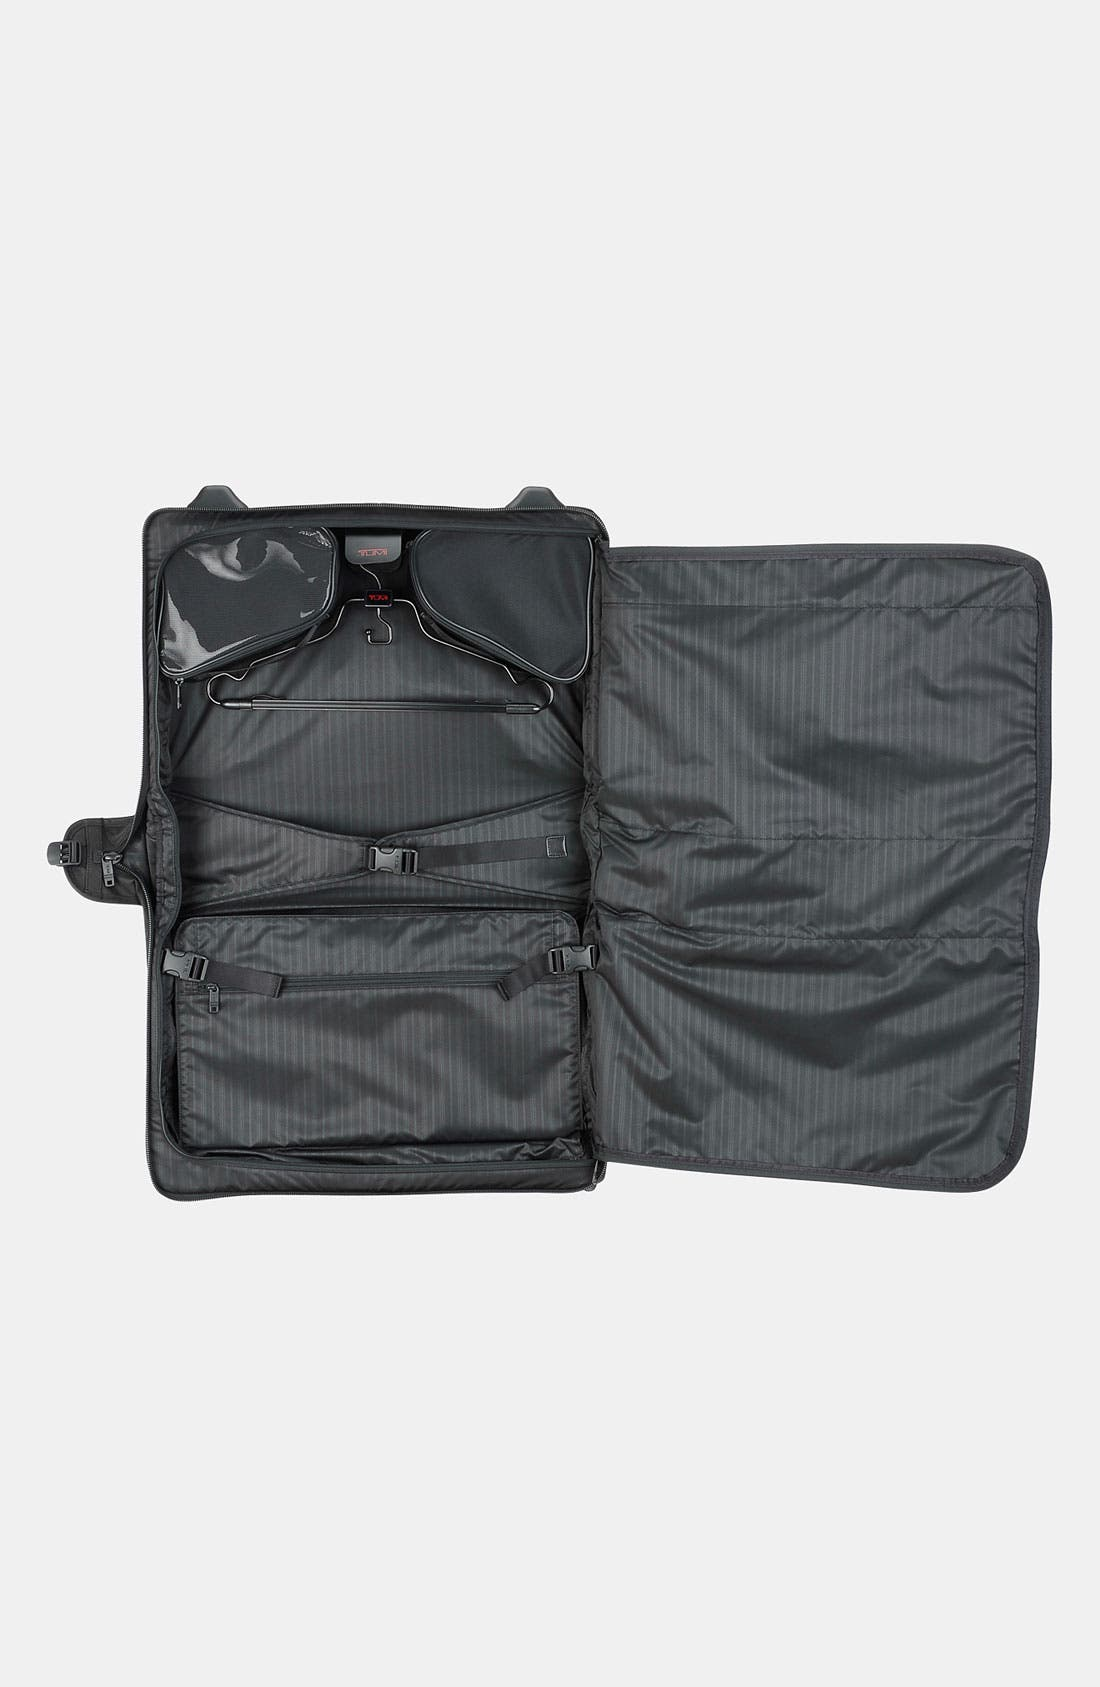 TUMI,                             'Alpha' Wheeled Carry-On Garment Bag,                             Alternate thumbnail 3, color,                             001